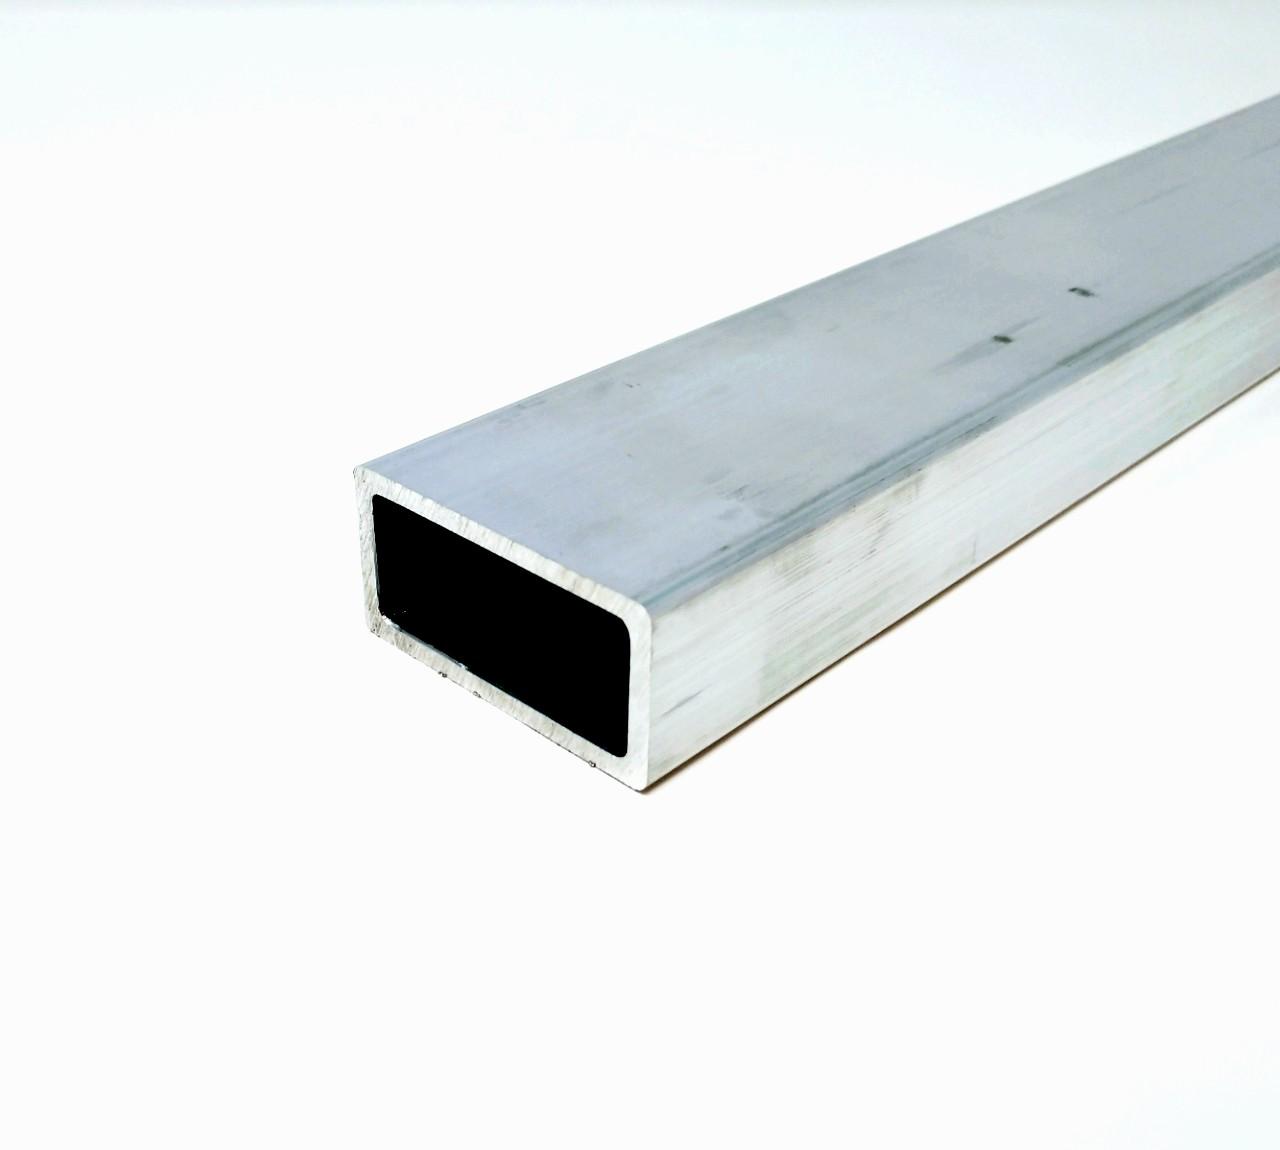 "Wall 6061 T6 Aluminum Square Tube 36/"" Piece 1/""X 1/"" X 1//8/"" .125"